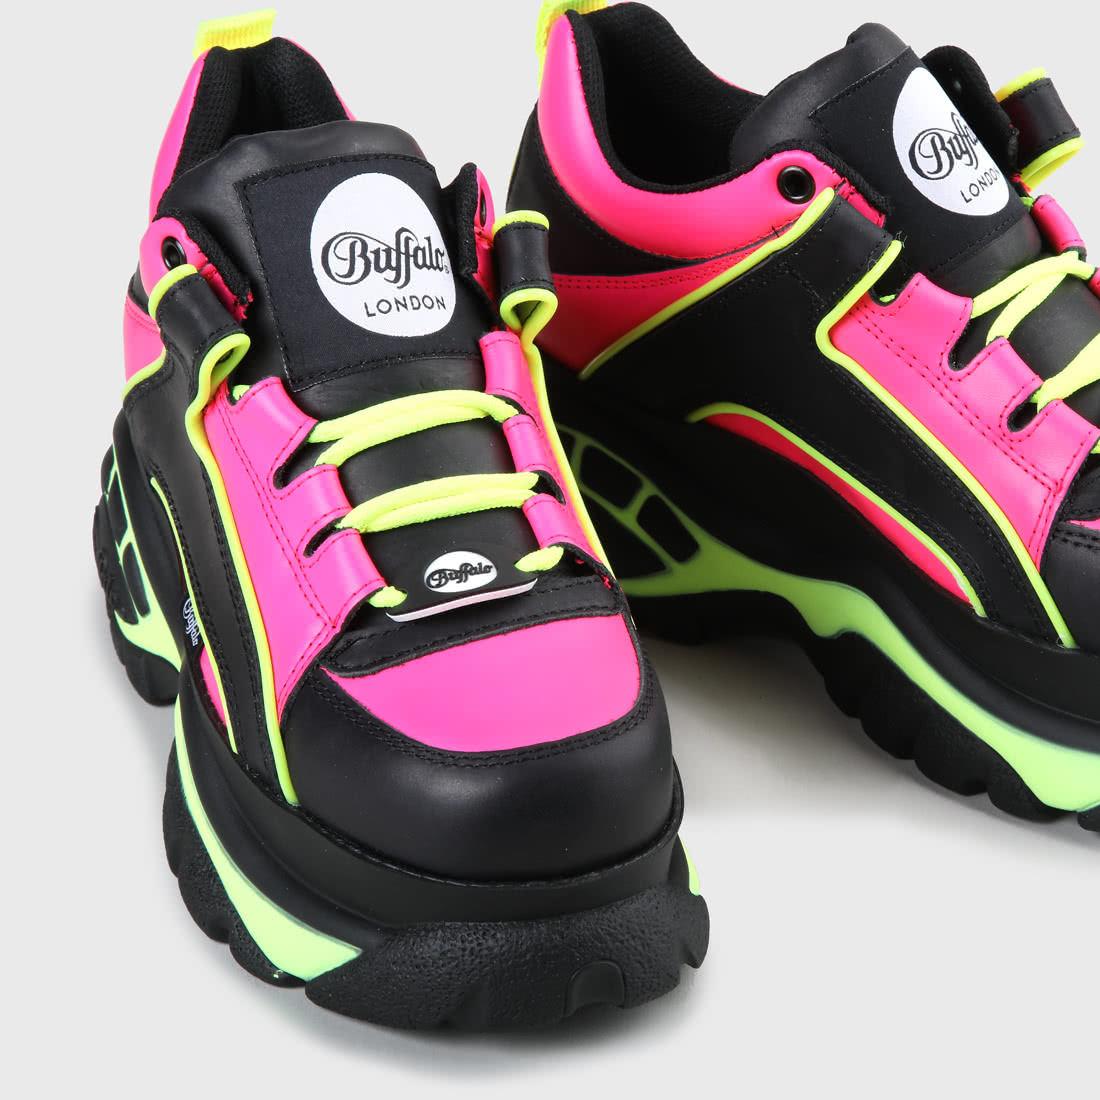 Buffalo Cuir À Classic Sneakers Acheter Chunky Noirfuchsia LMGSzVqpU